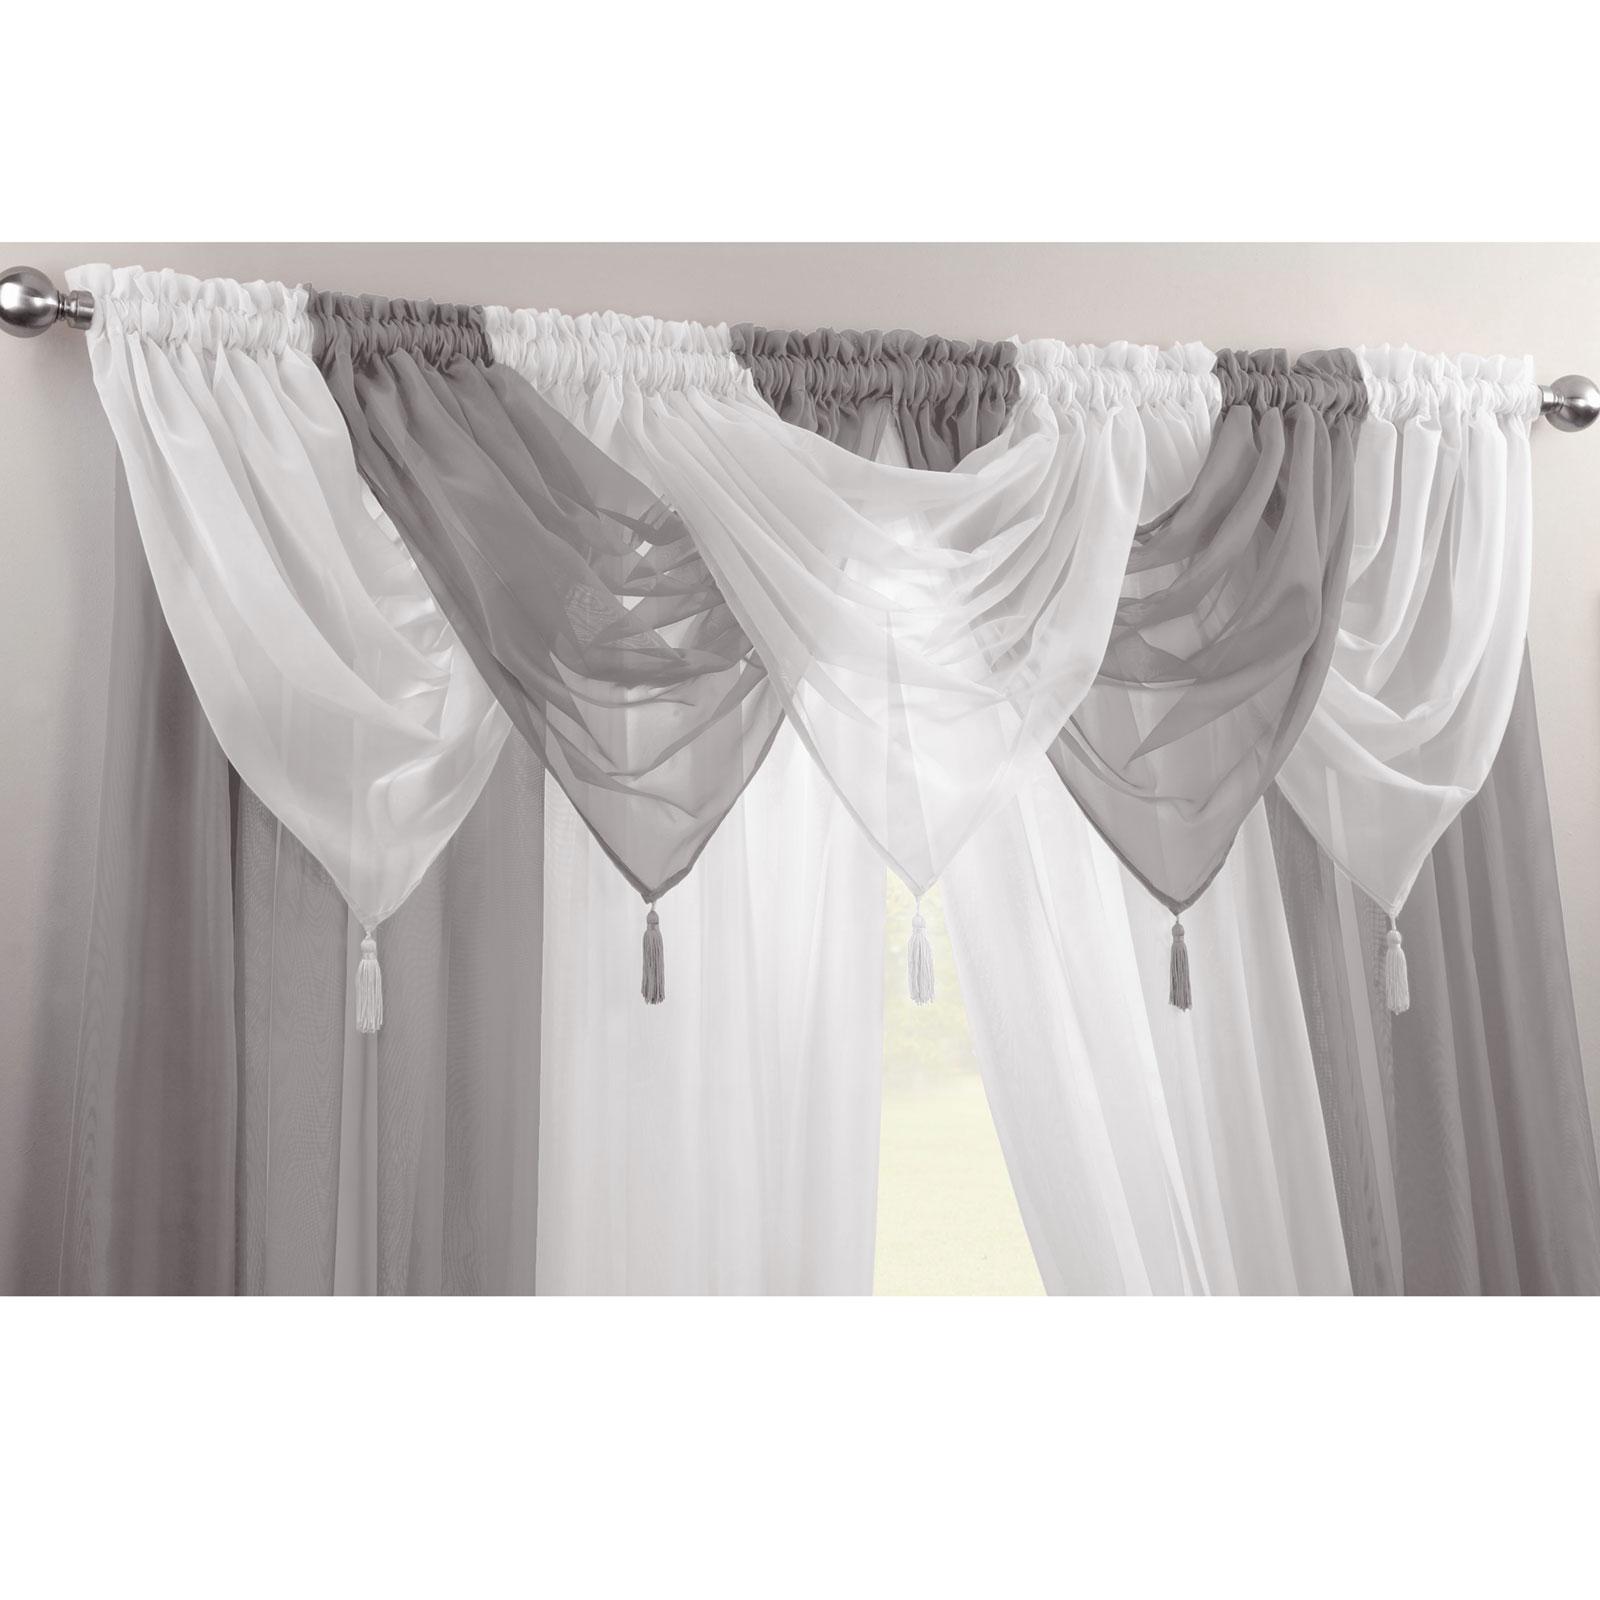 Plain-Tasselled-Voile-Swag-Net-Valance-Pelmet-For-Curtains-Slot-Top-Single